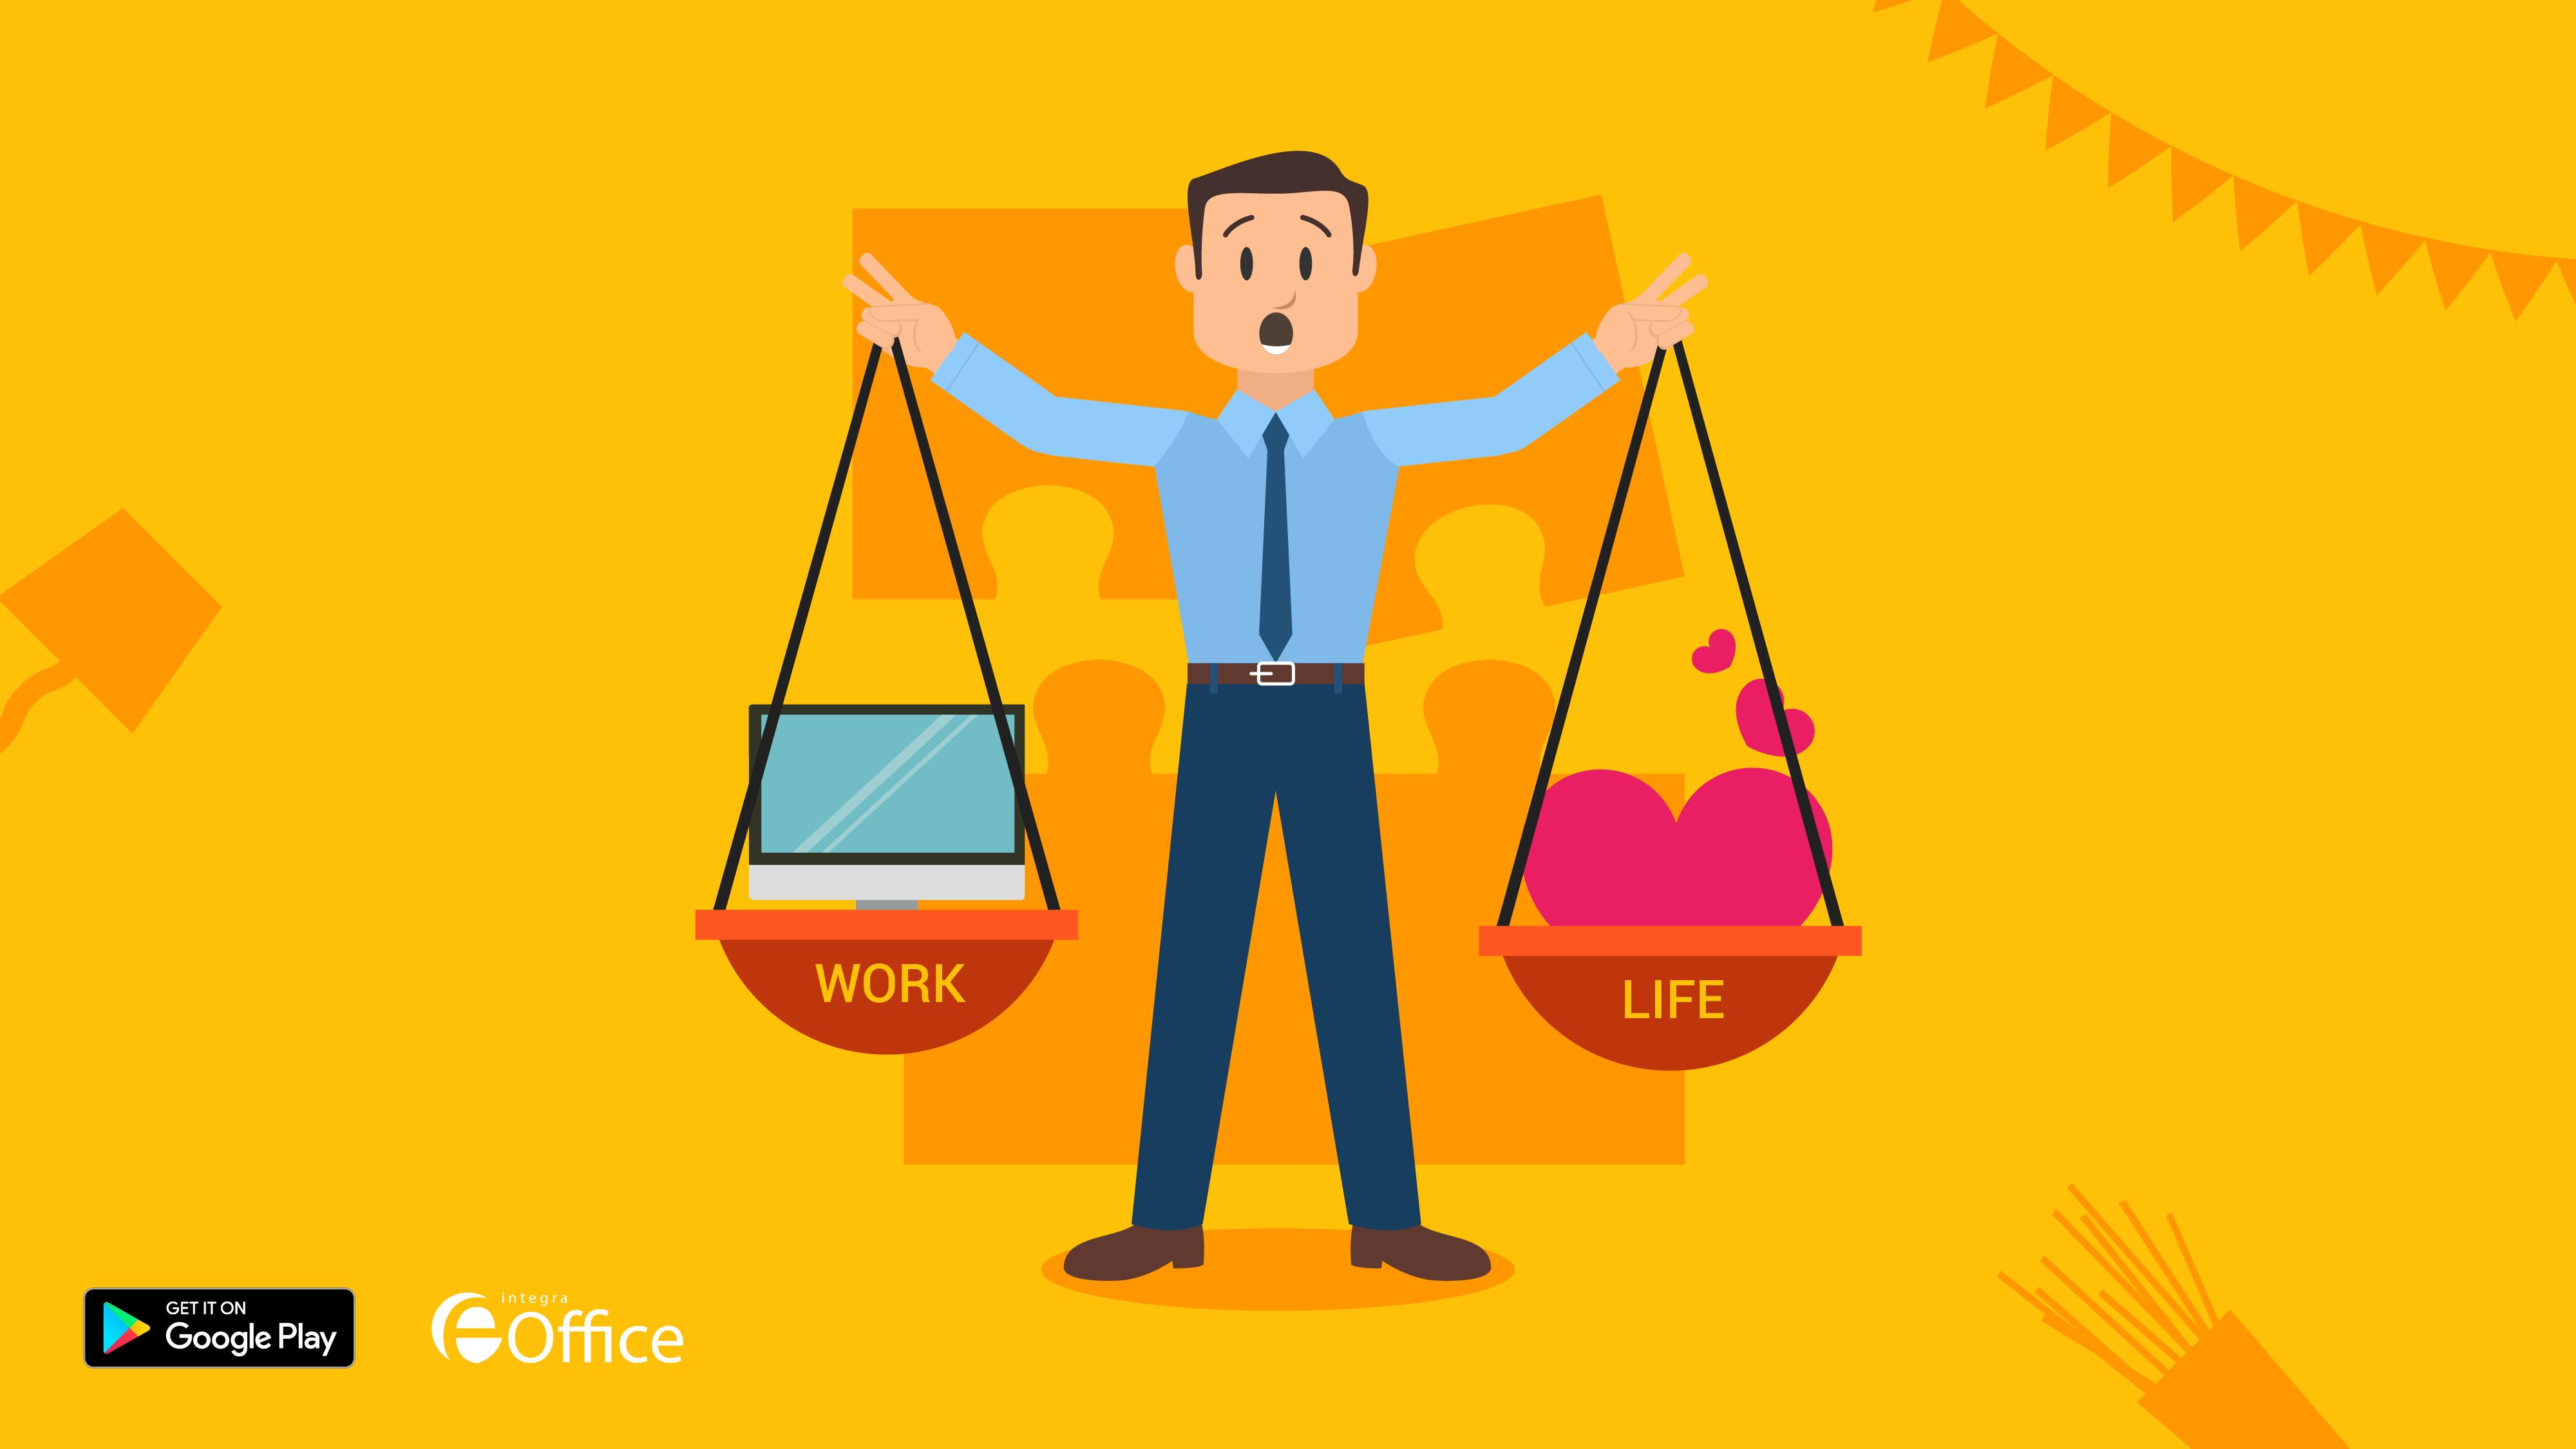 Menyeimbangkan Kehidupan Pribadi dengan Kehidupan Profesional Anda